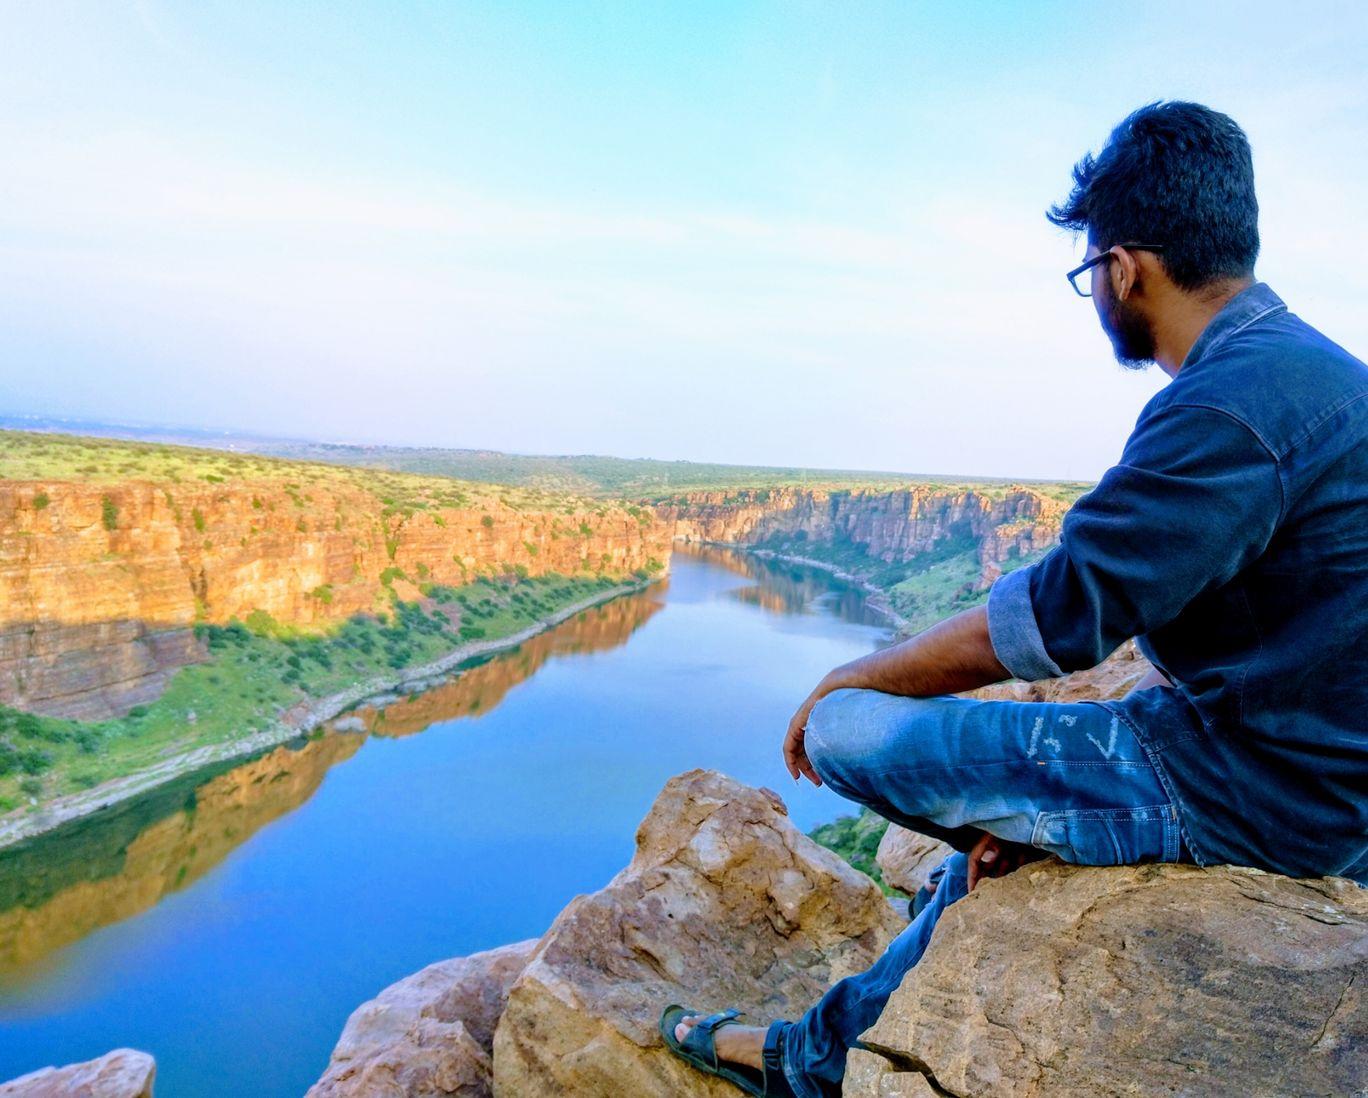 Photo of Gandikota Penna River View By uday krishna reddy